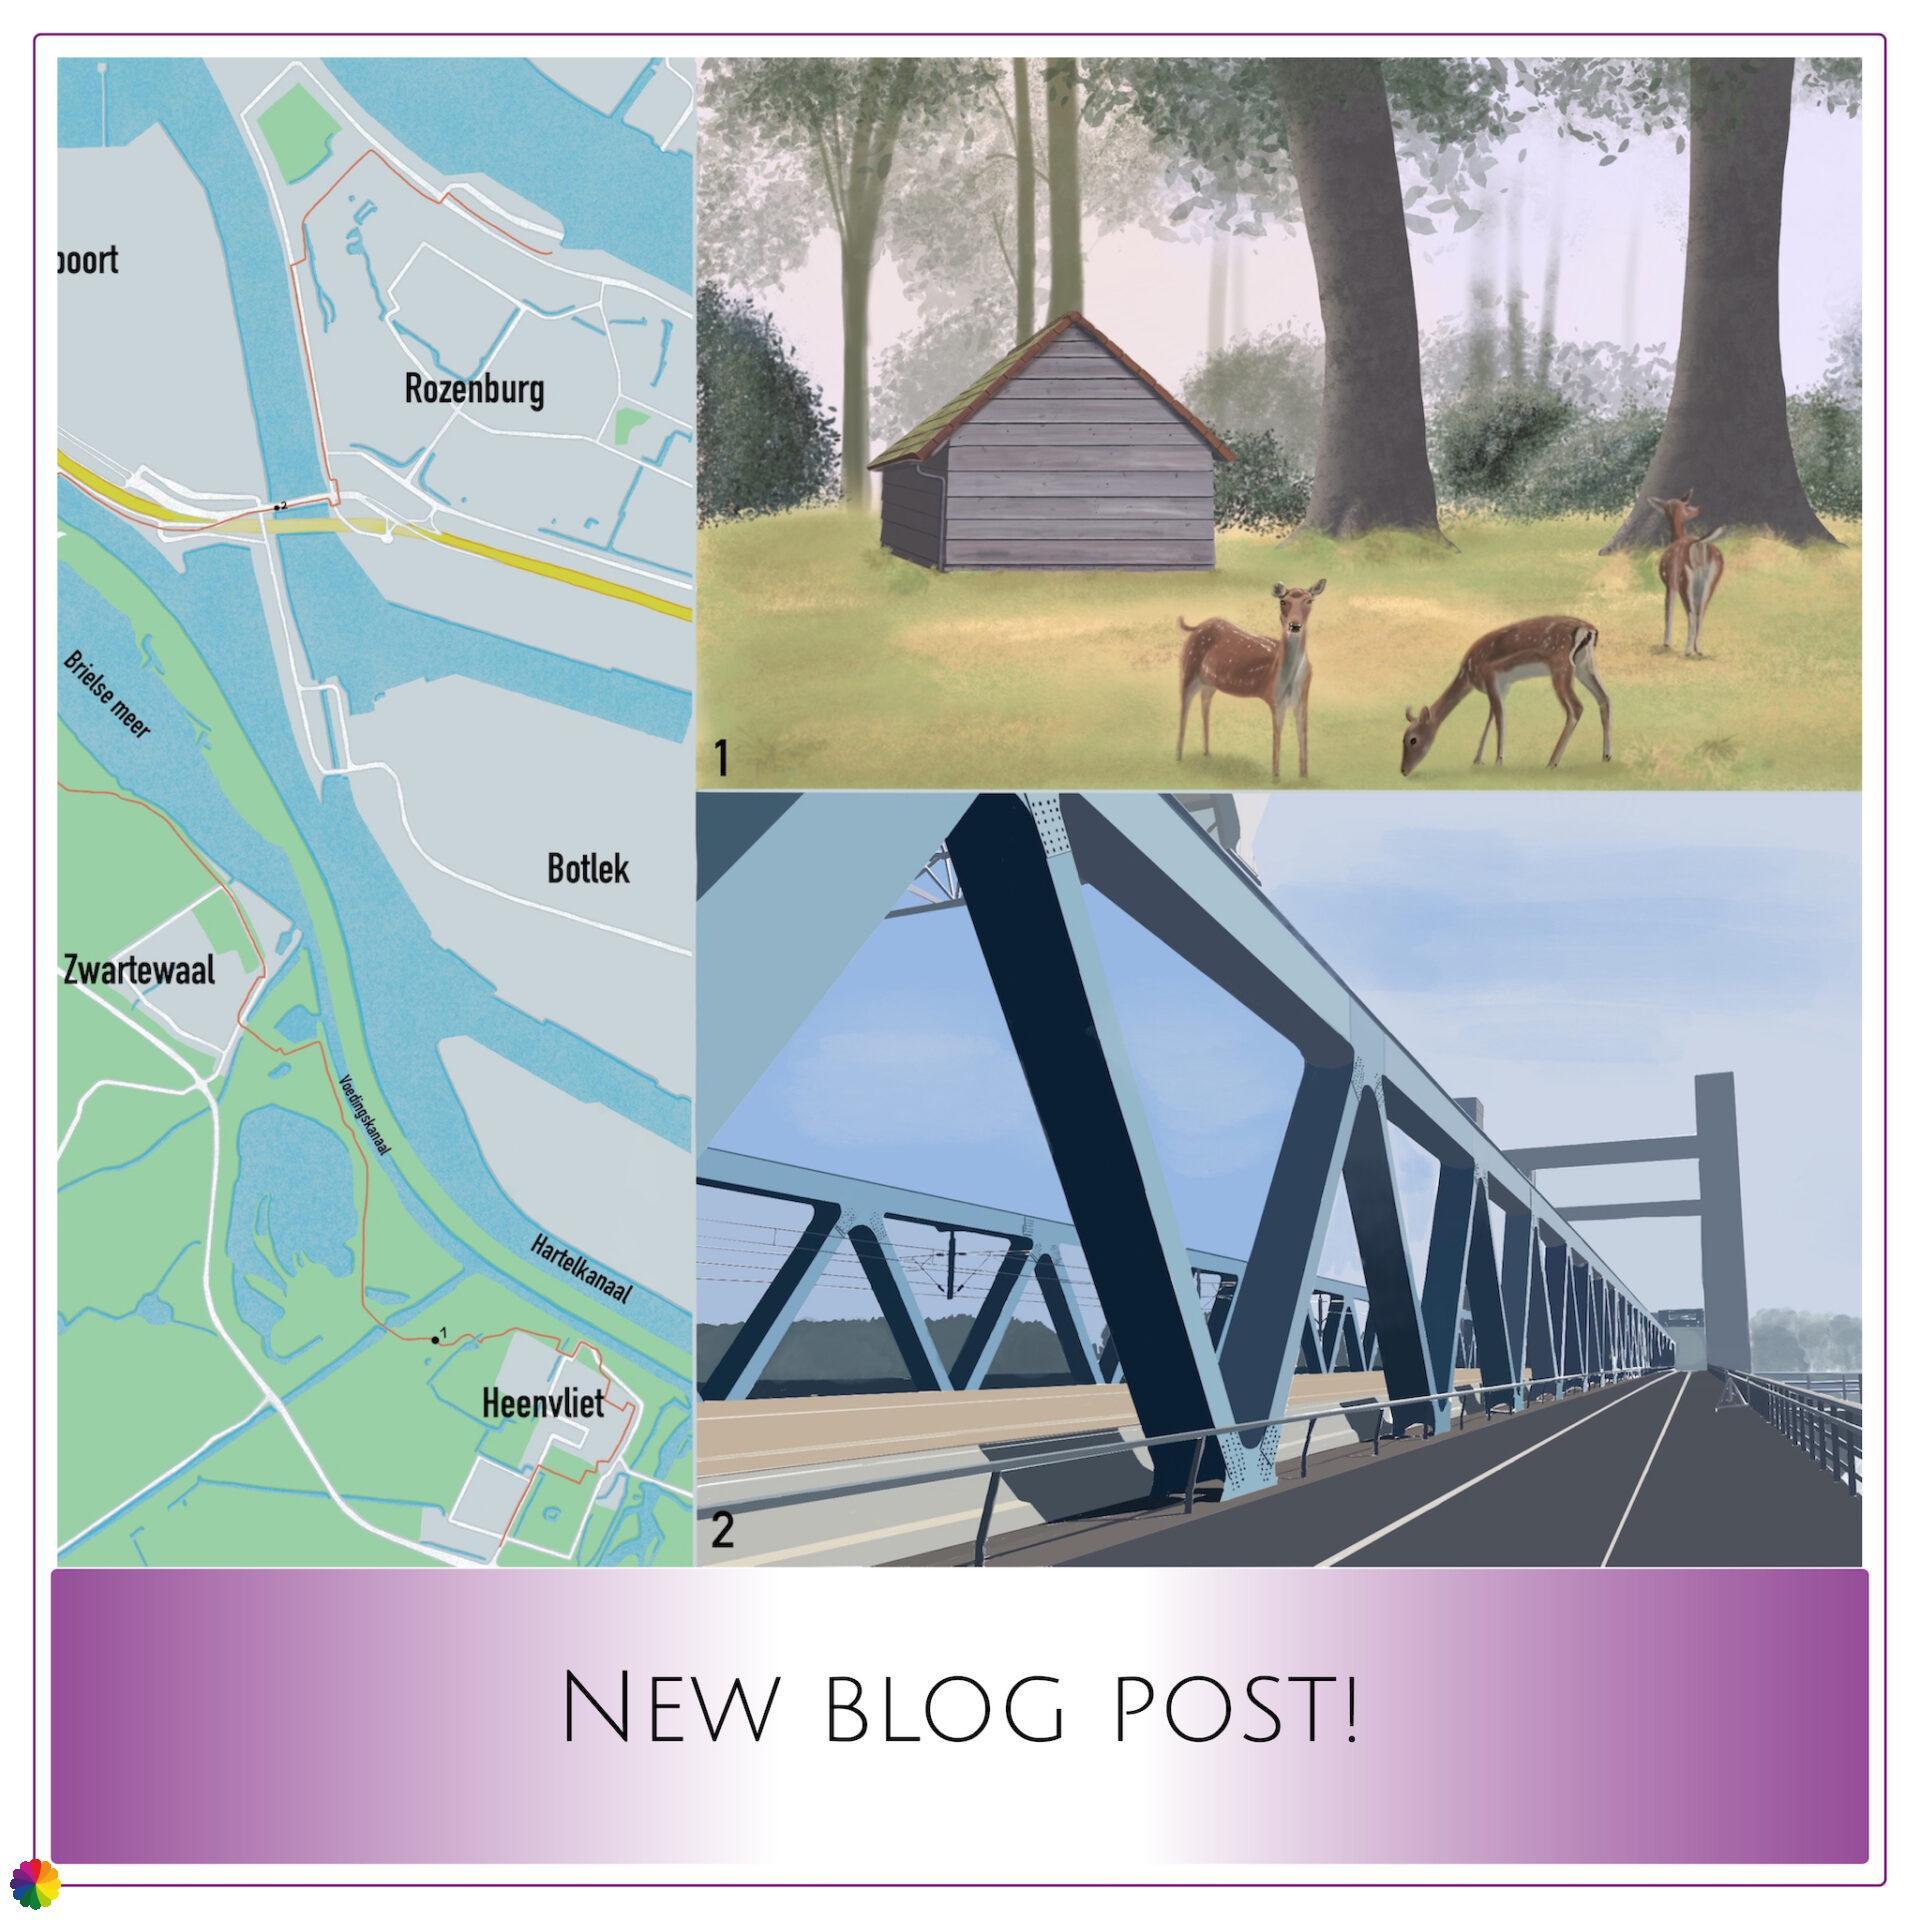 Blog-update Heenvliet - Rozenburg